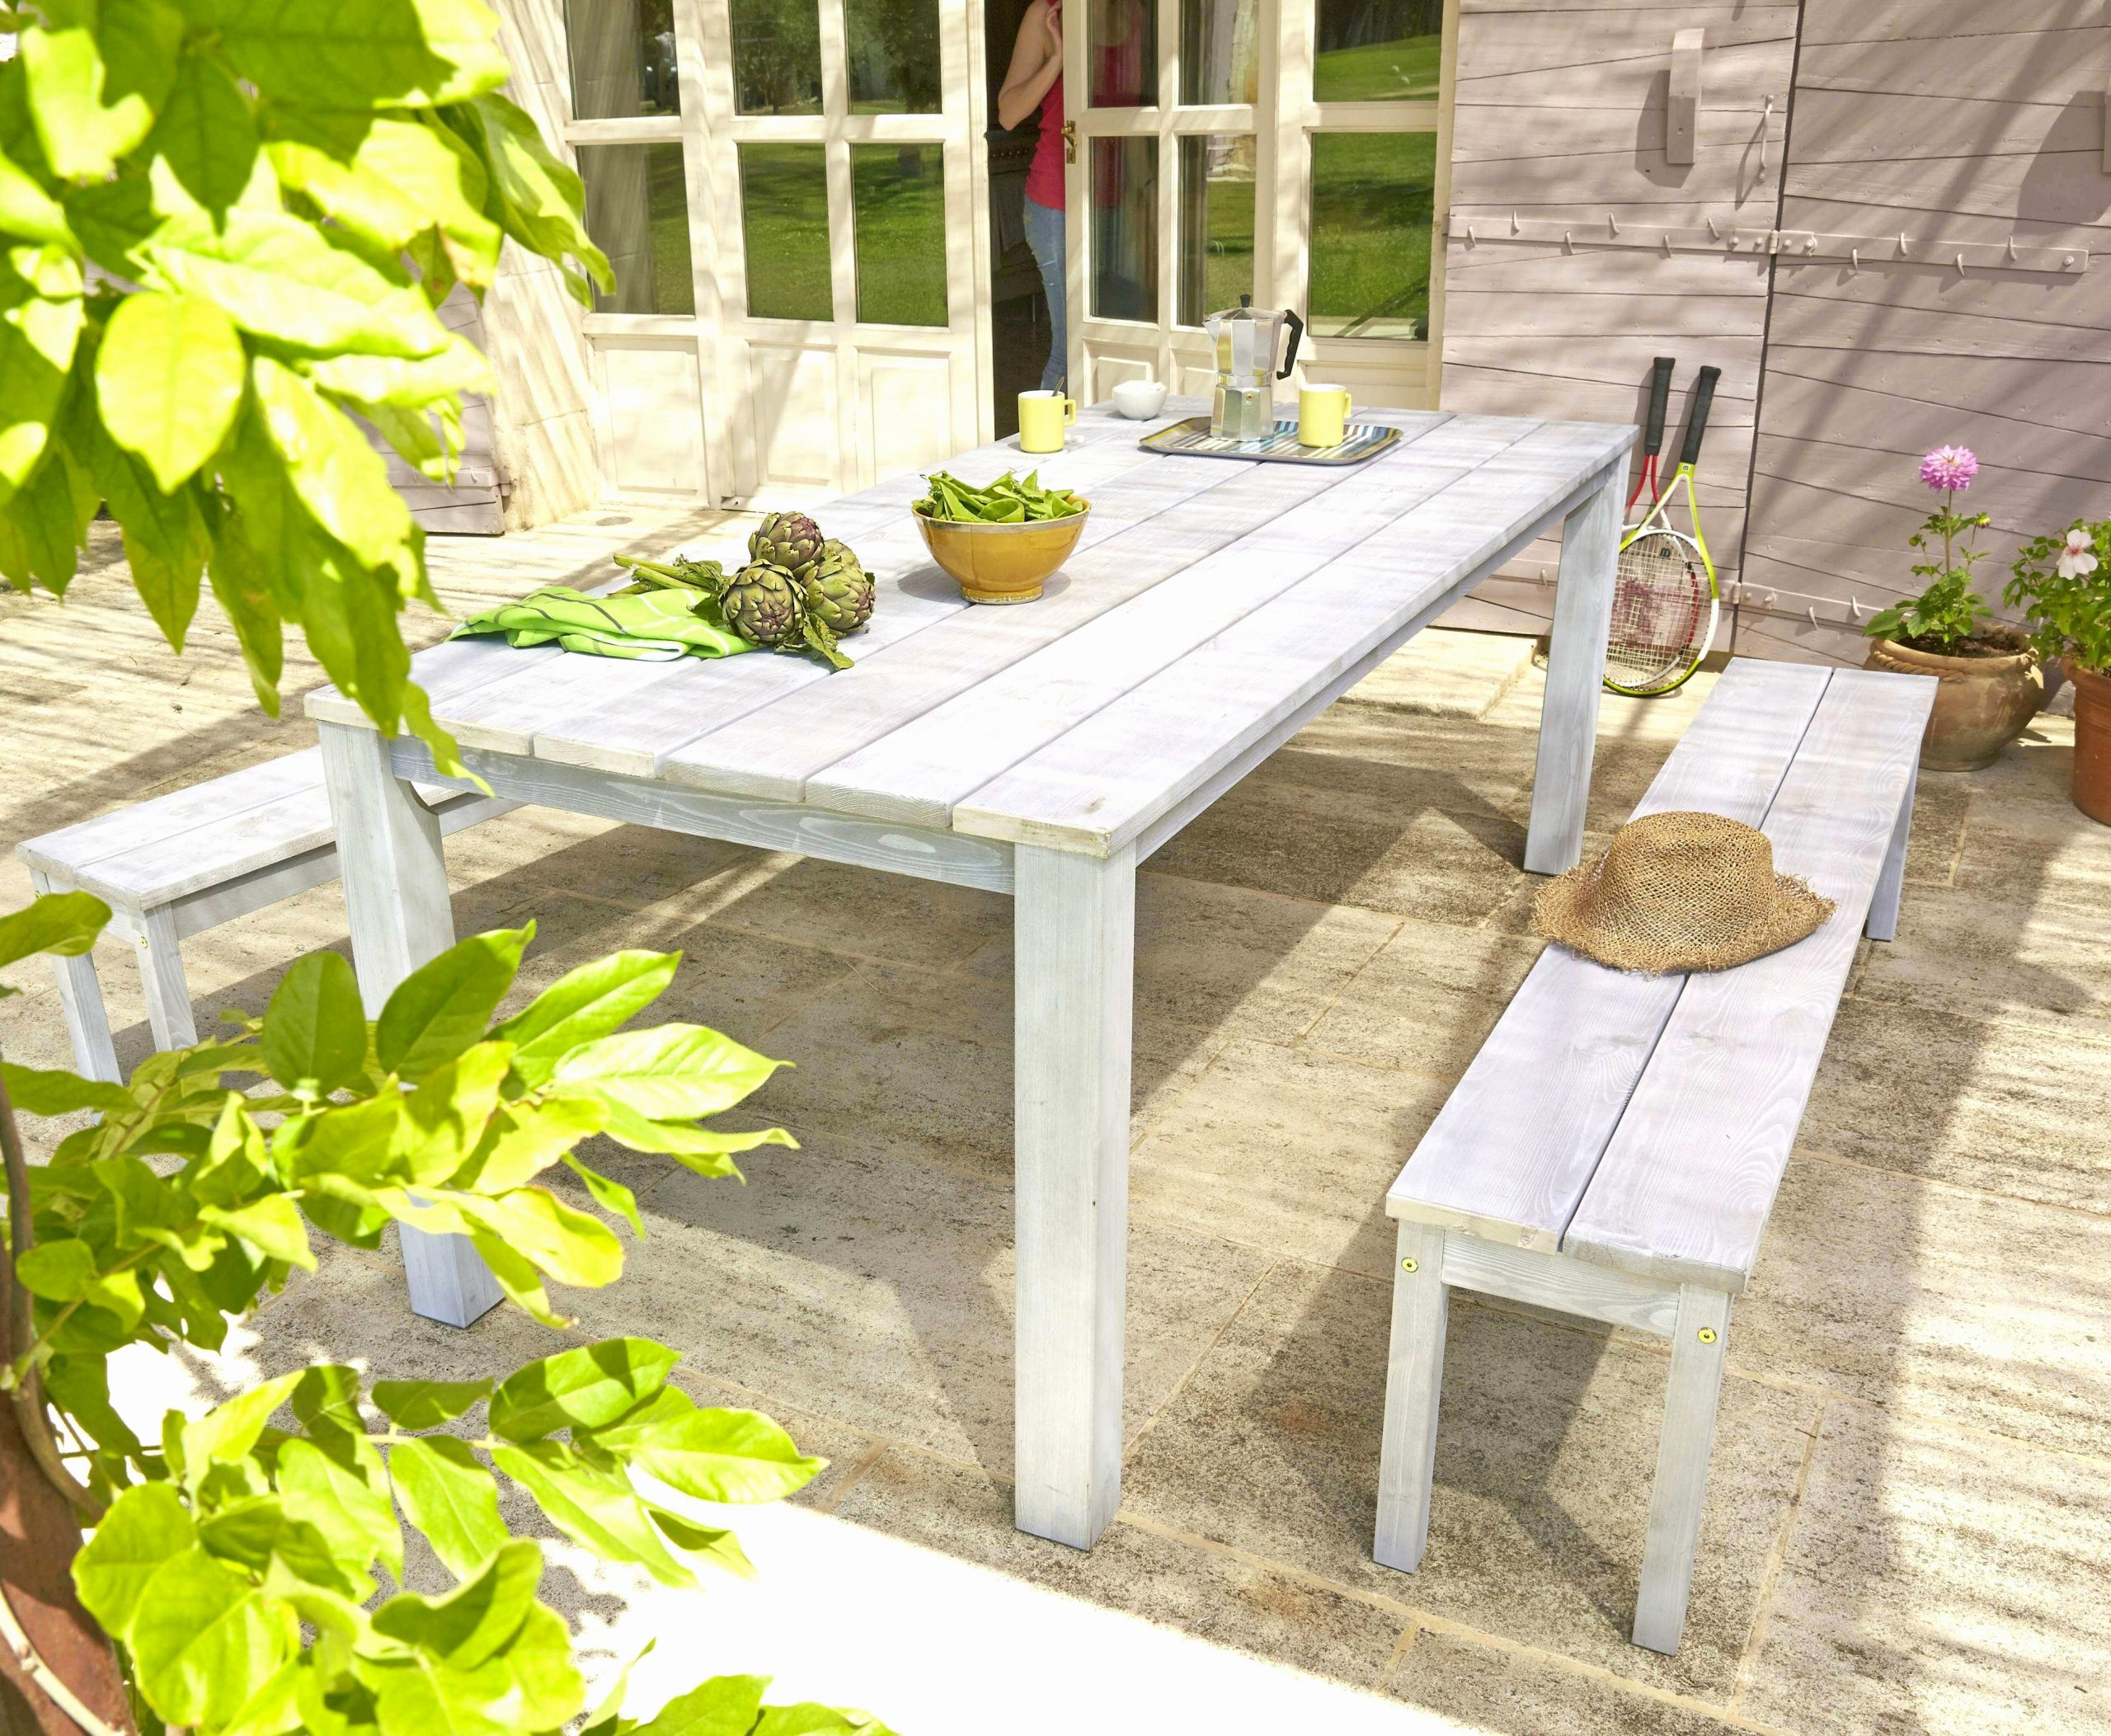 Salon De Jardin Intermarche 2018 Luxe Inspirational ... pour Intermarché Table De Jardin